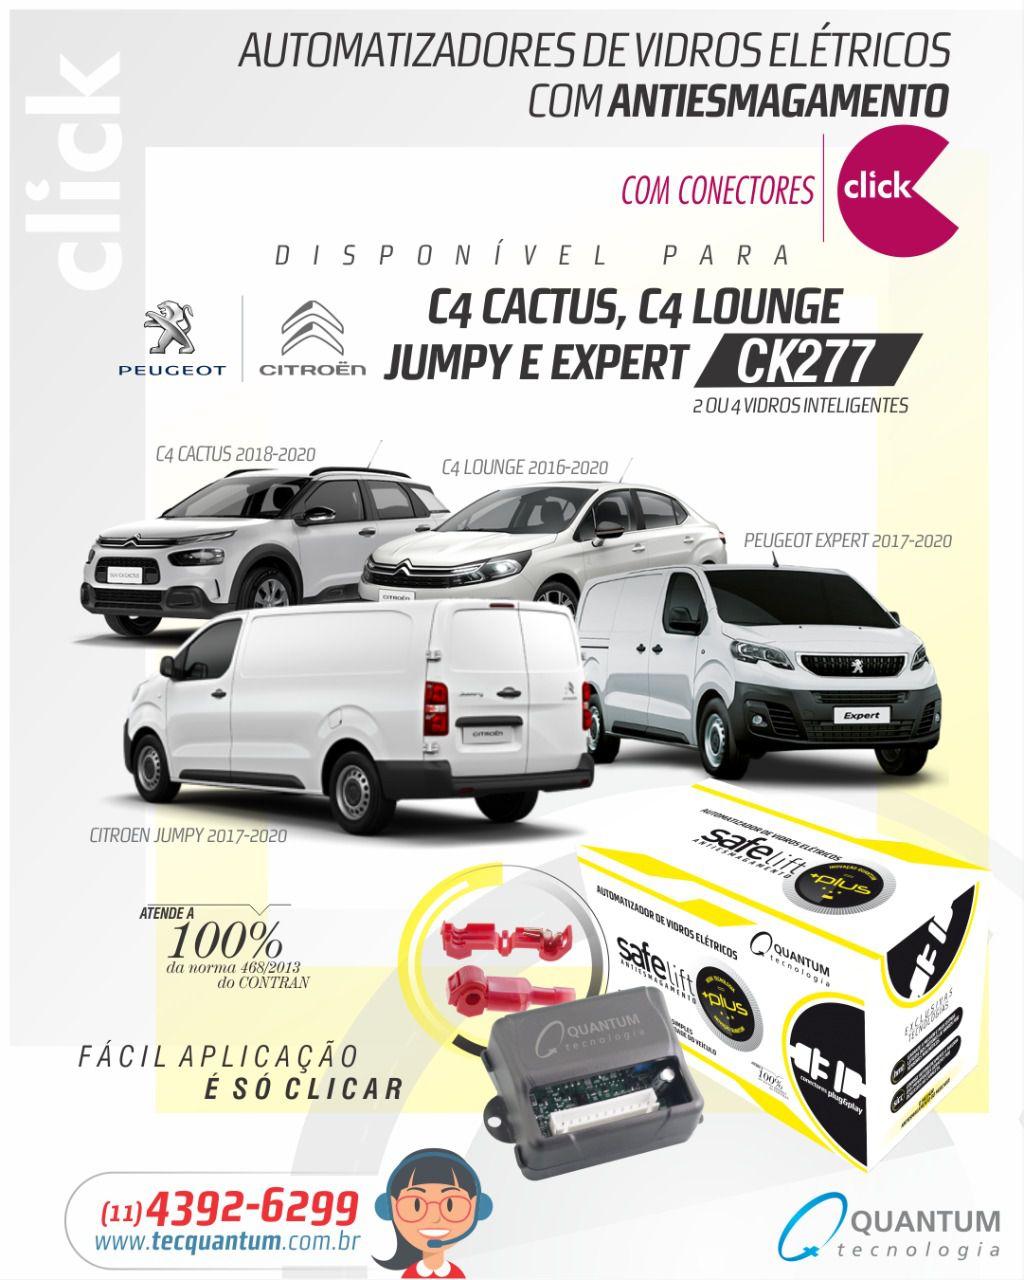 Peugeot Expert (2 vidros inteligentes) CK277